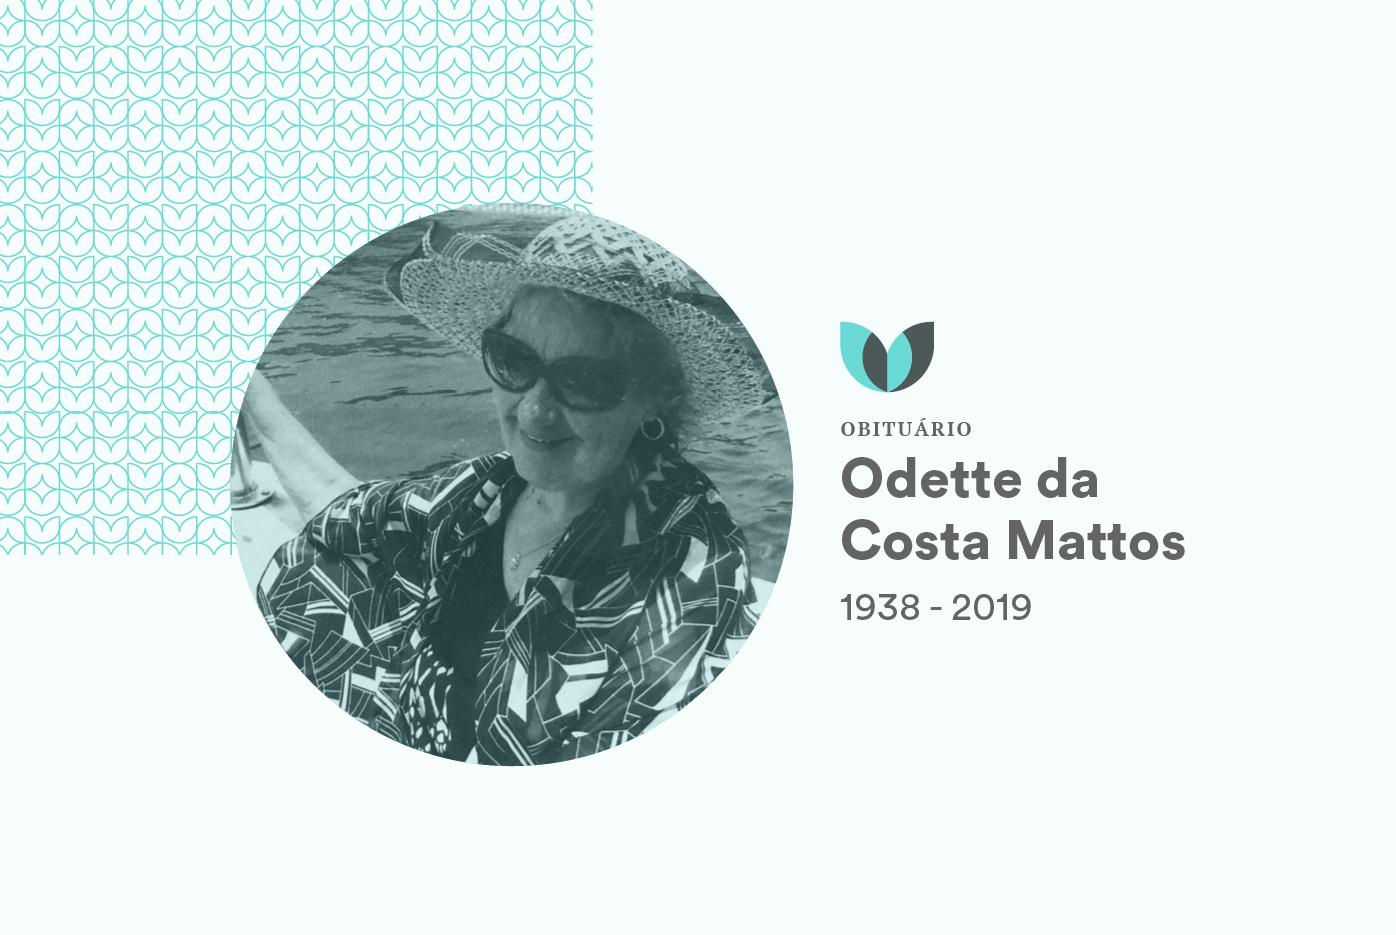 Obituario-Odette-Squarespace.png